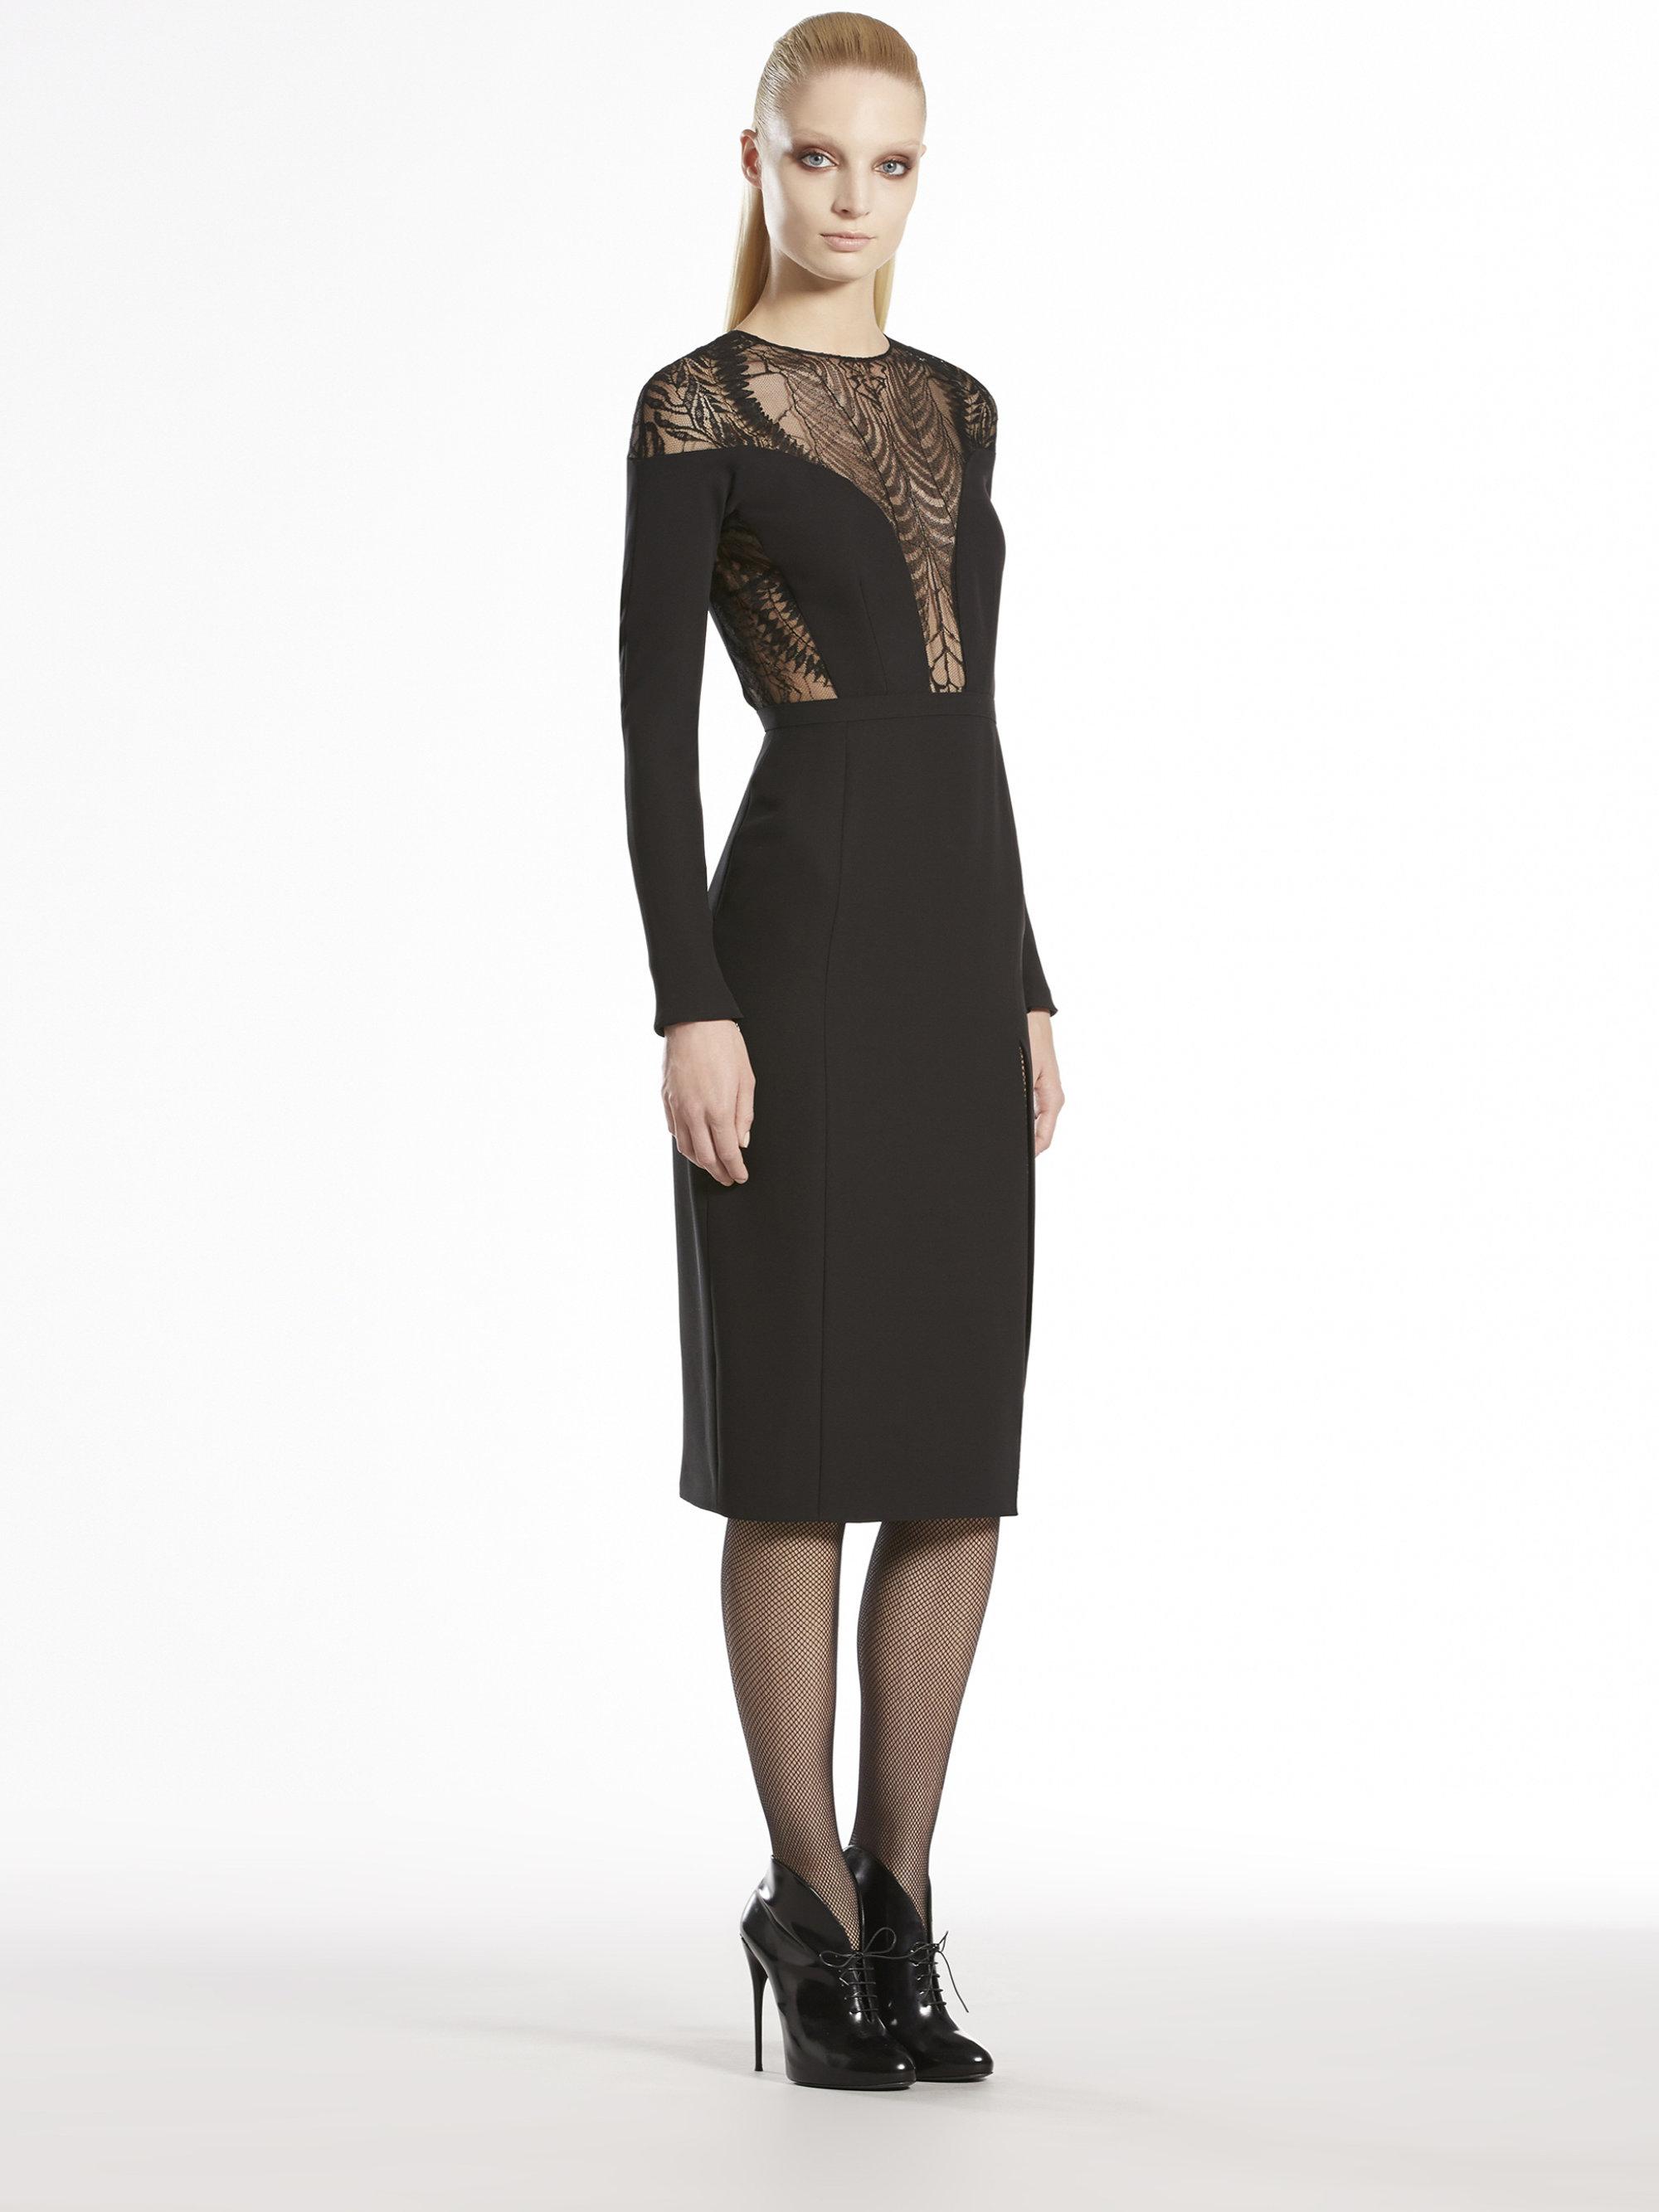 macys long sleeve dresses photo - 1